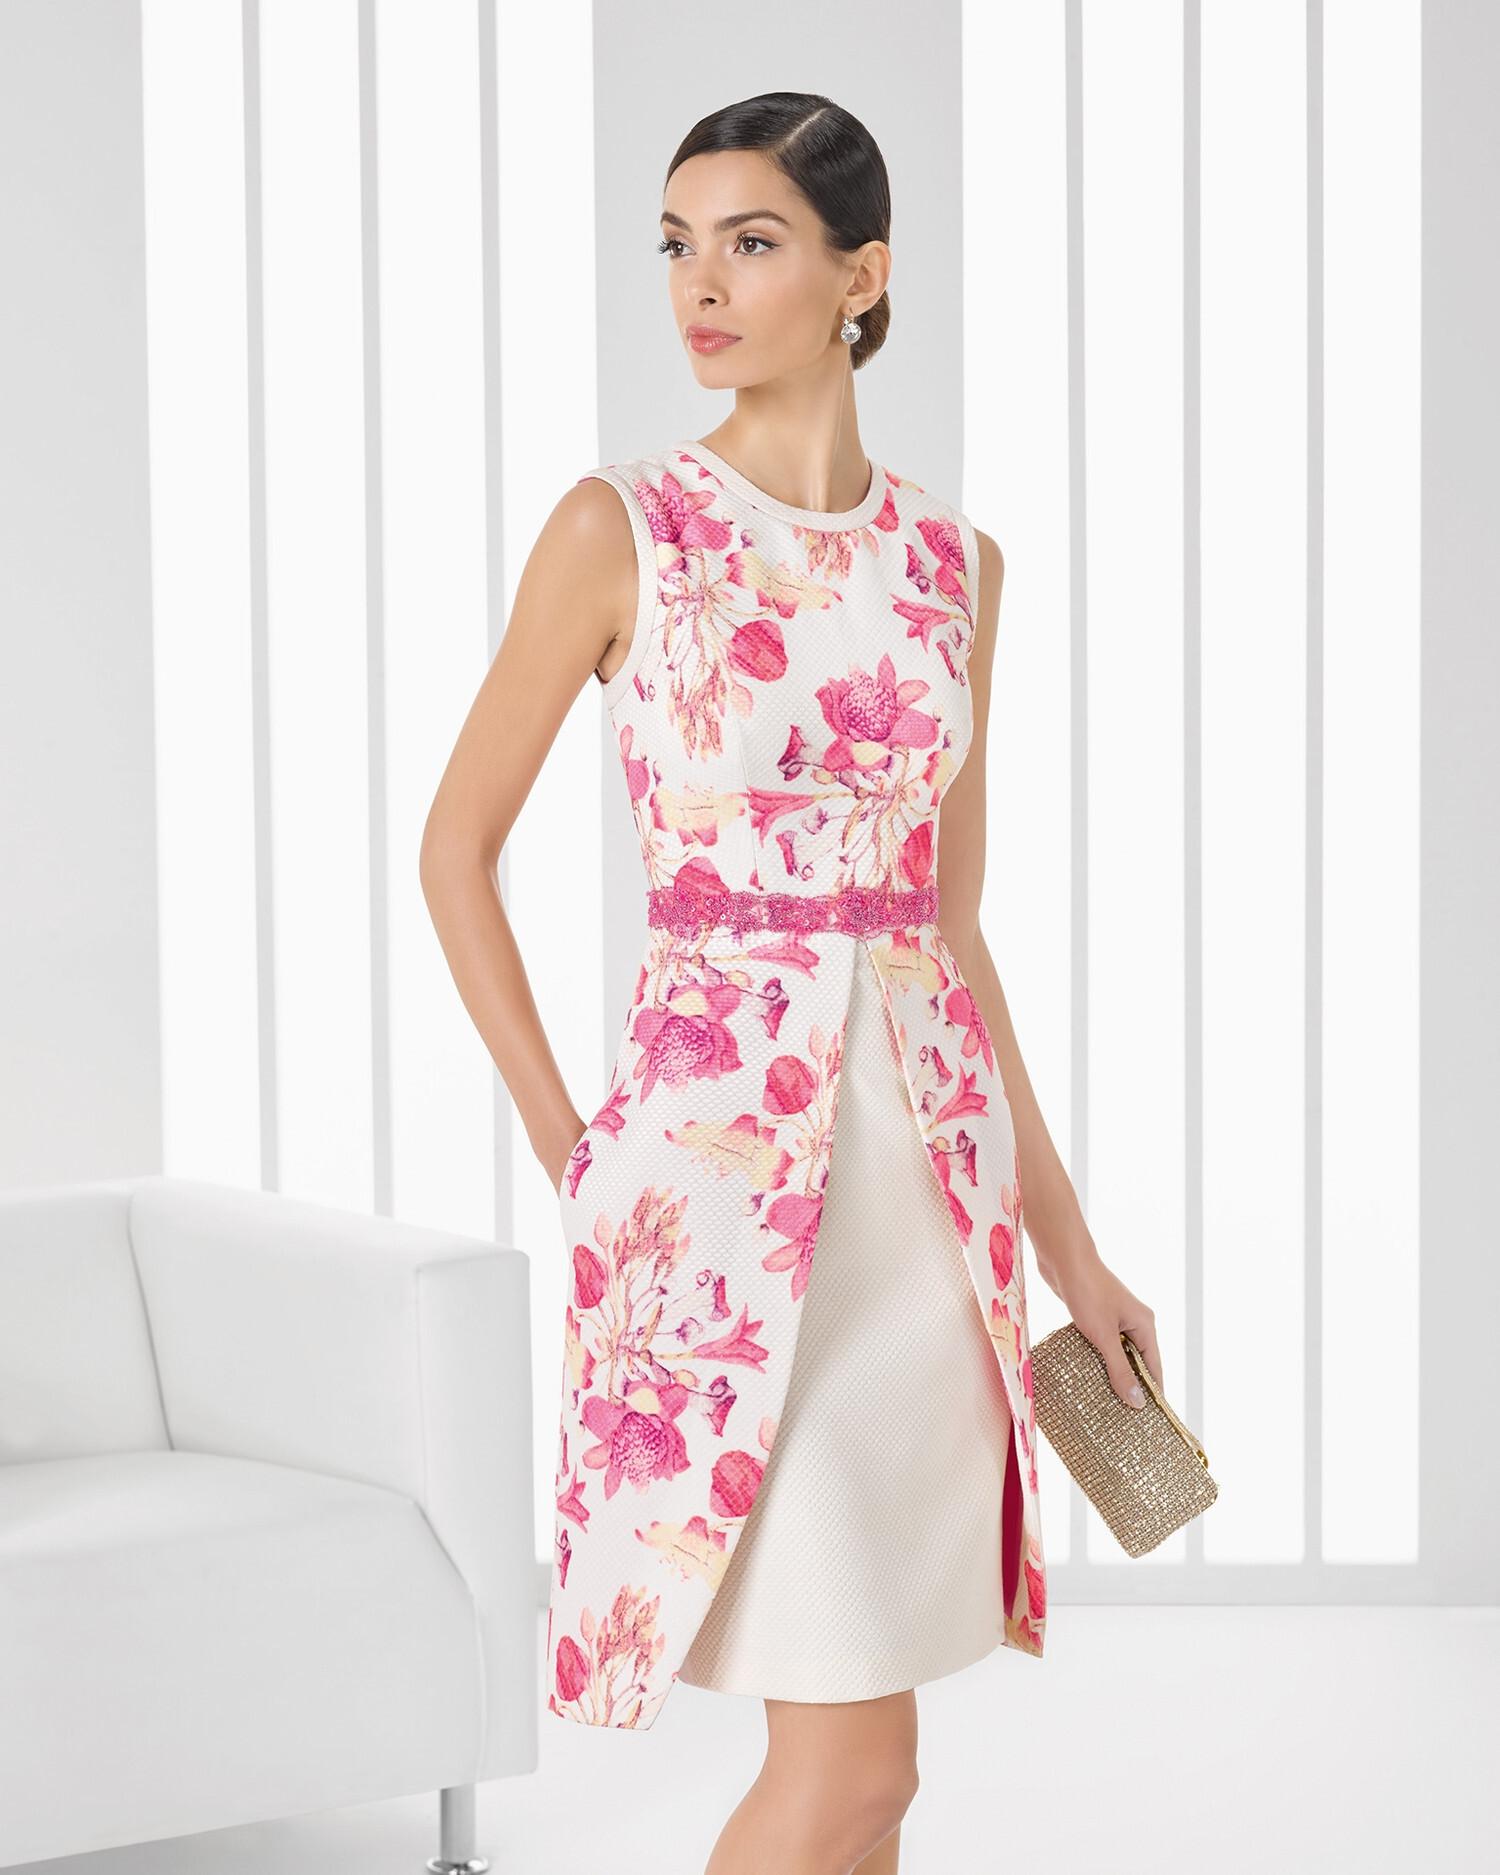 Vestidos Rosa_Other dresses_dressesss